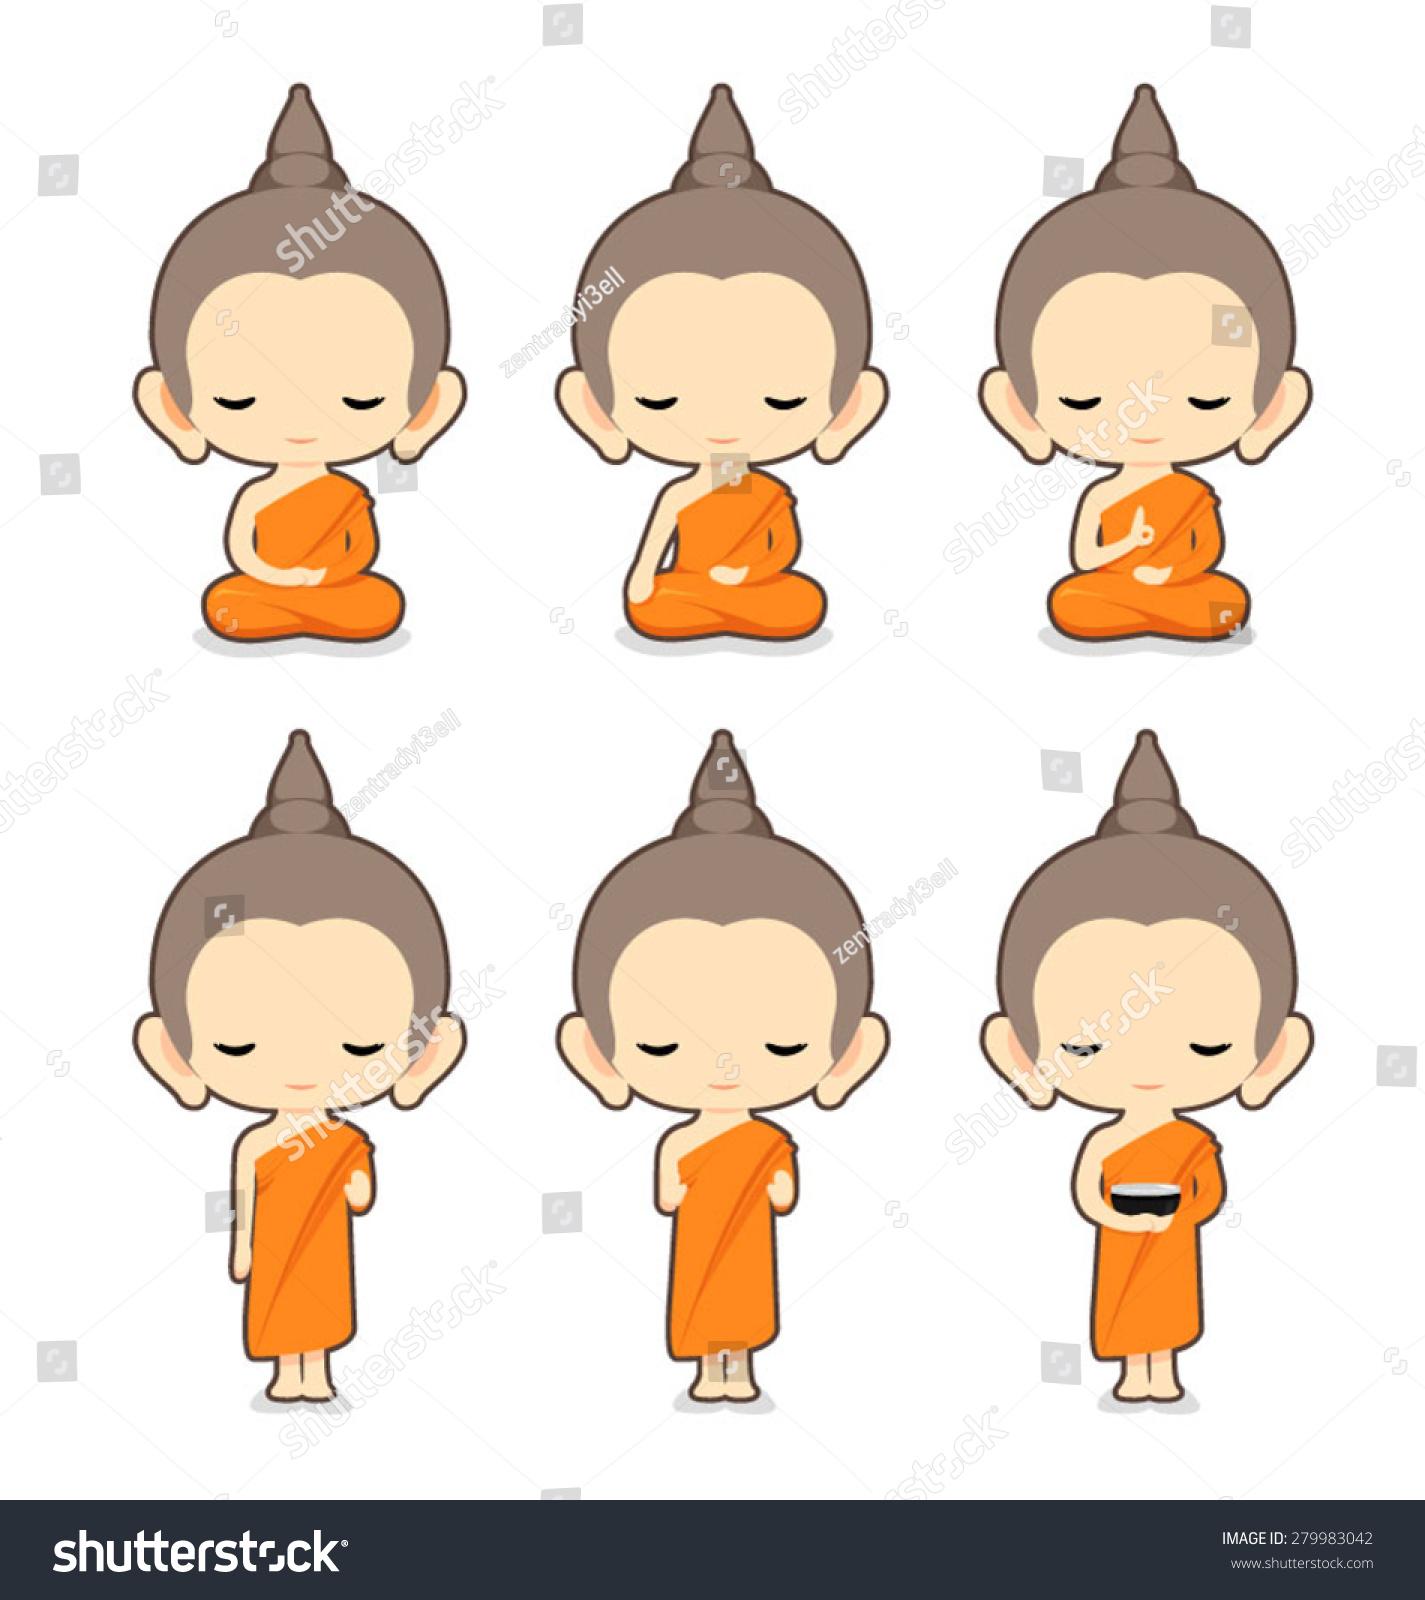 Character Design Vector : Buddhist monk character designvector illustration stock